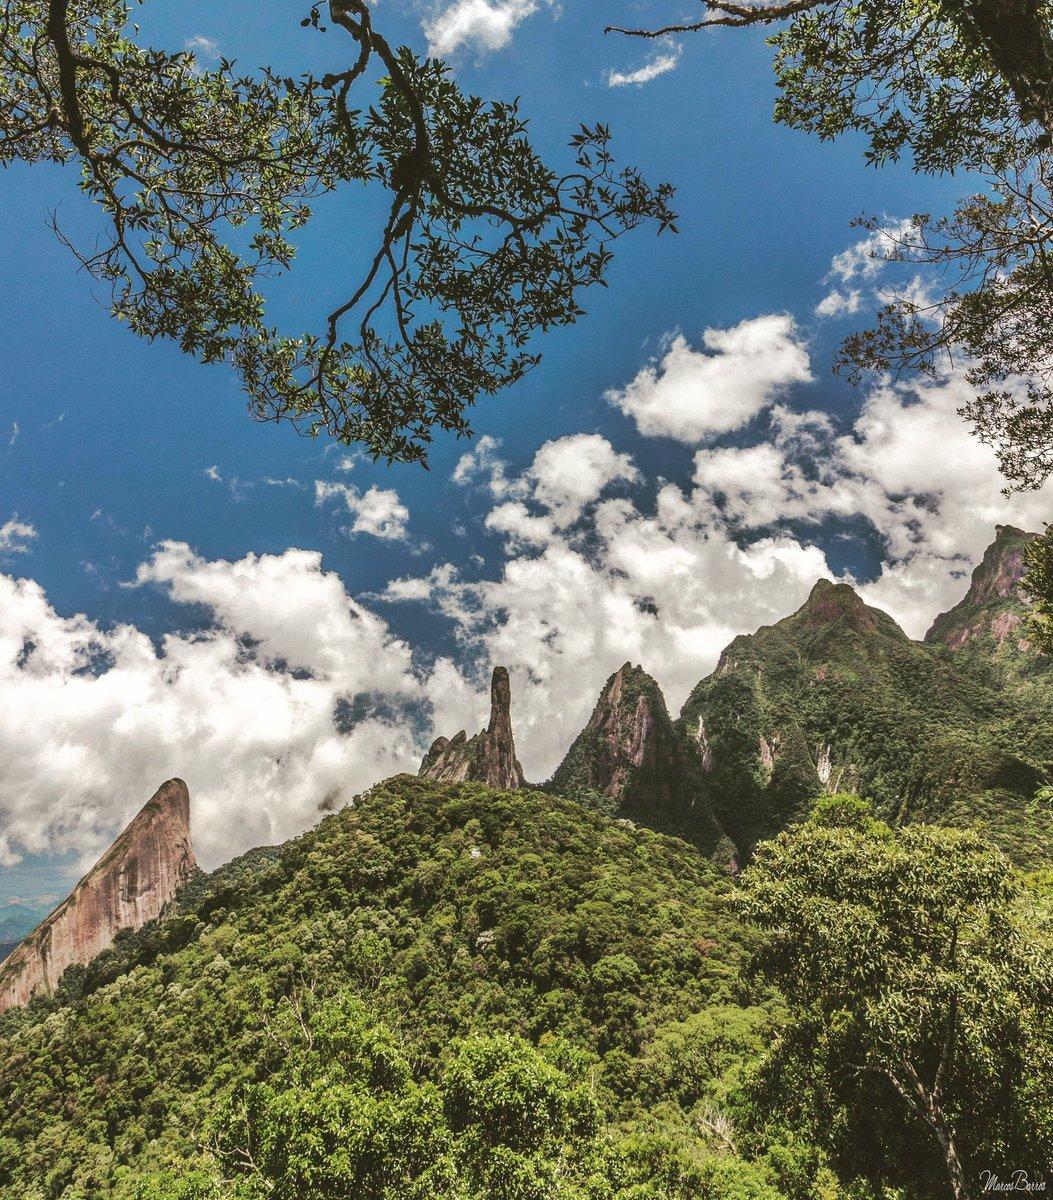 Parque Nacional da Serra dos Órgãos, #Teresopolis, #Brasil  #Parnaso #landscape #mountains #montanhas #RiodeJaneiro #paisajes #PintoFotografía #Canon #Brazil #forest